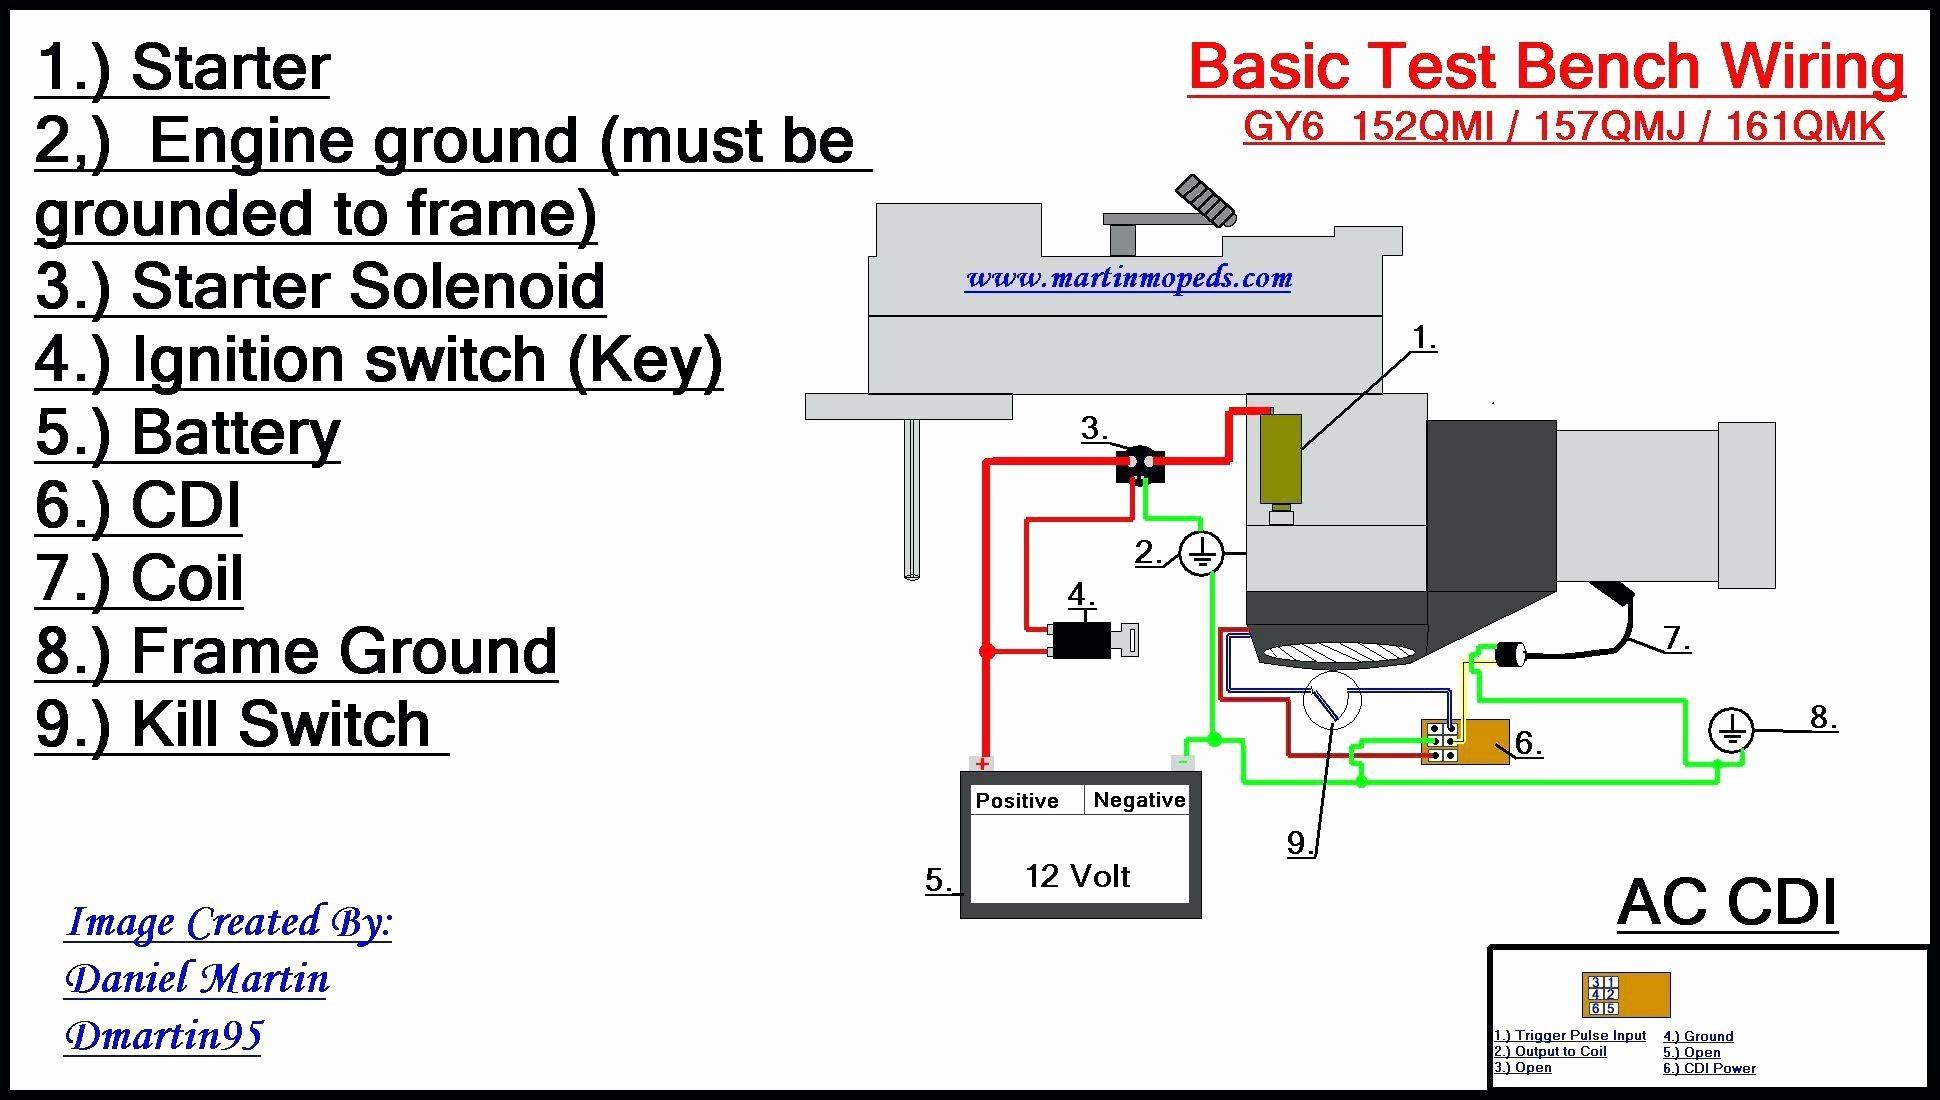 5 Pin Cdi Box Wiring Diagram New Cdi Wiring Diagram Besides 6 Pin Cdi Wiring Diagram